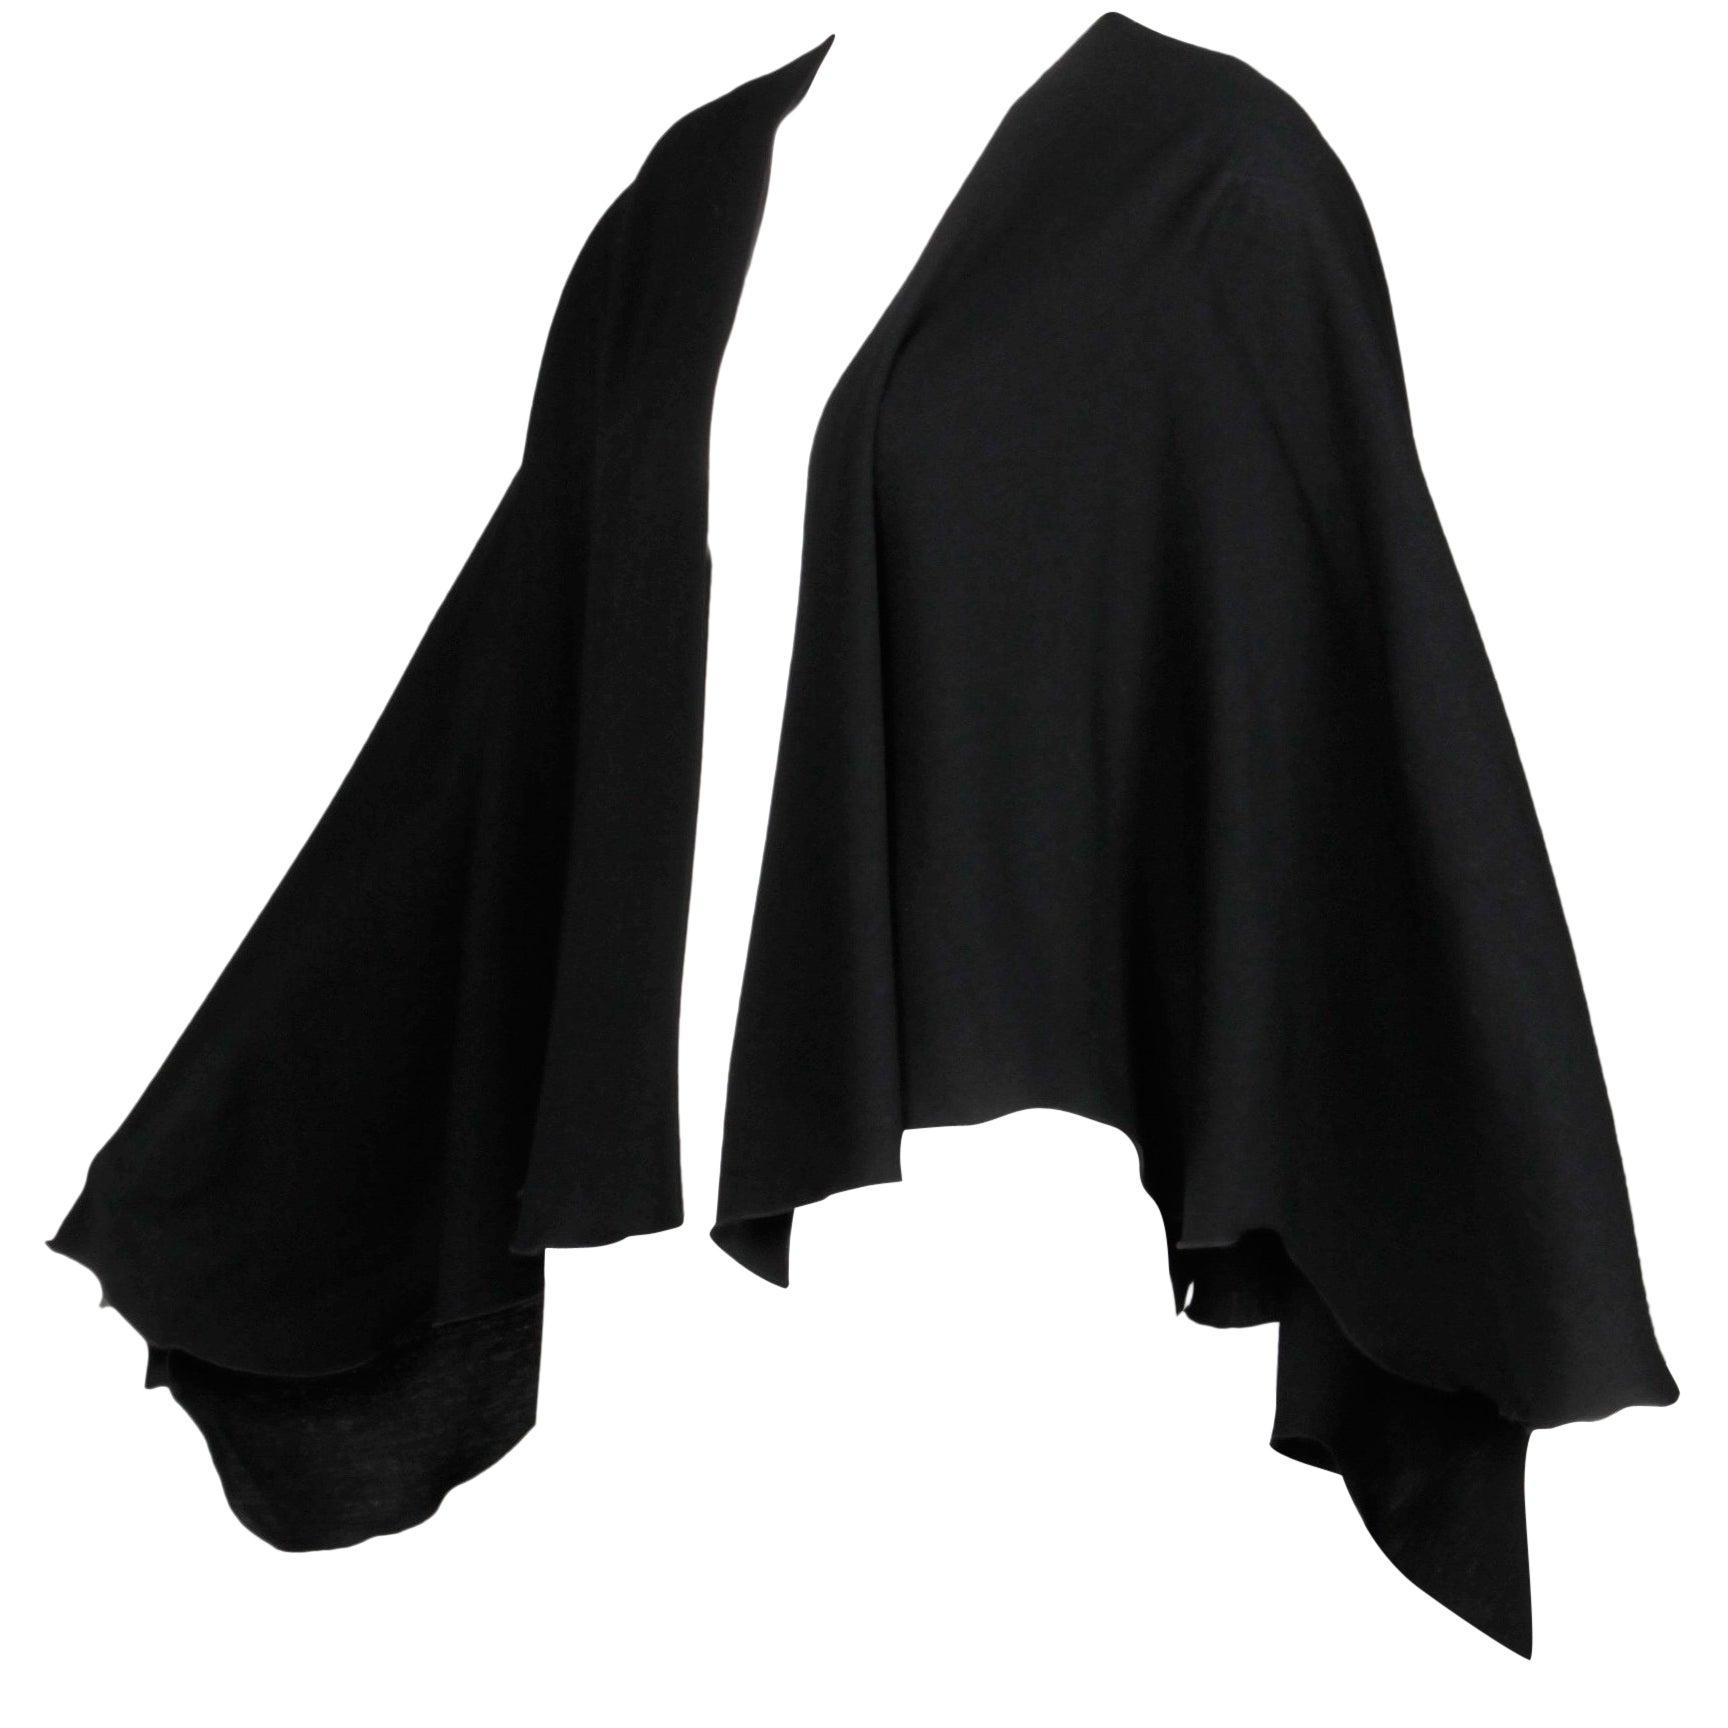 1970s Mr. Blackwell for Bullock Wilshire Black Scalloped Wool Cape, Wrap Jacket